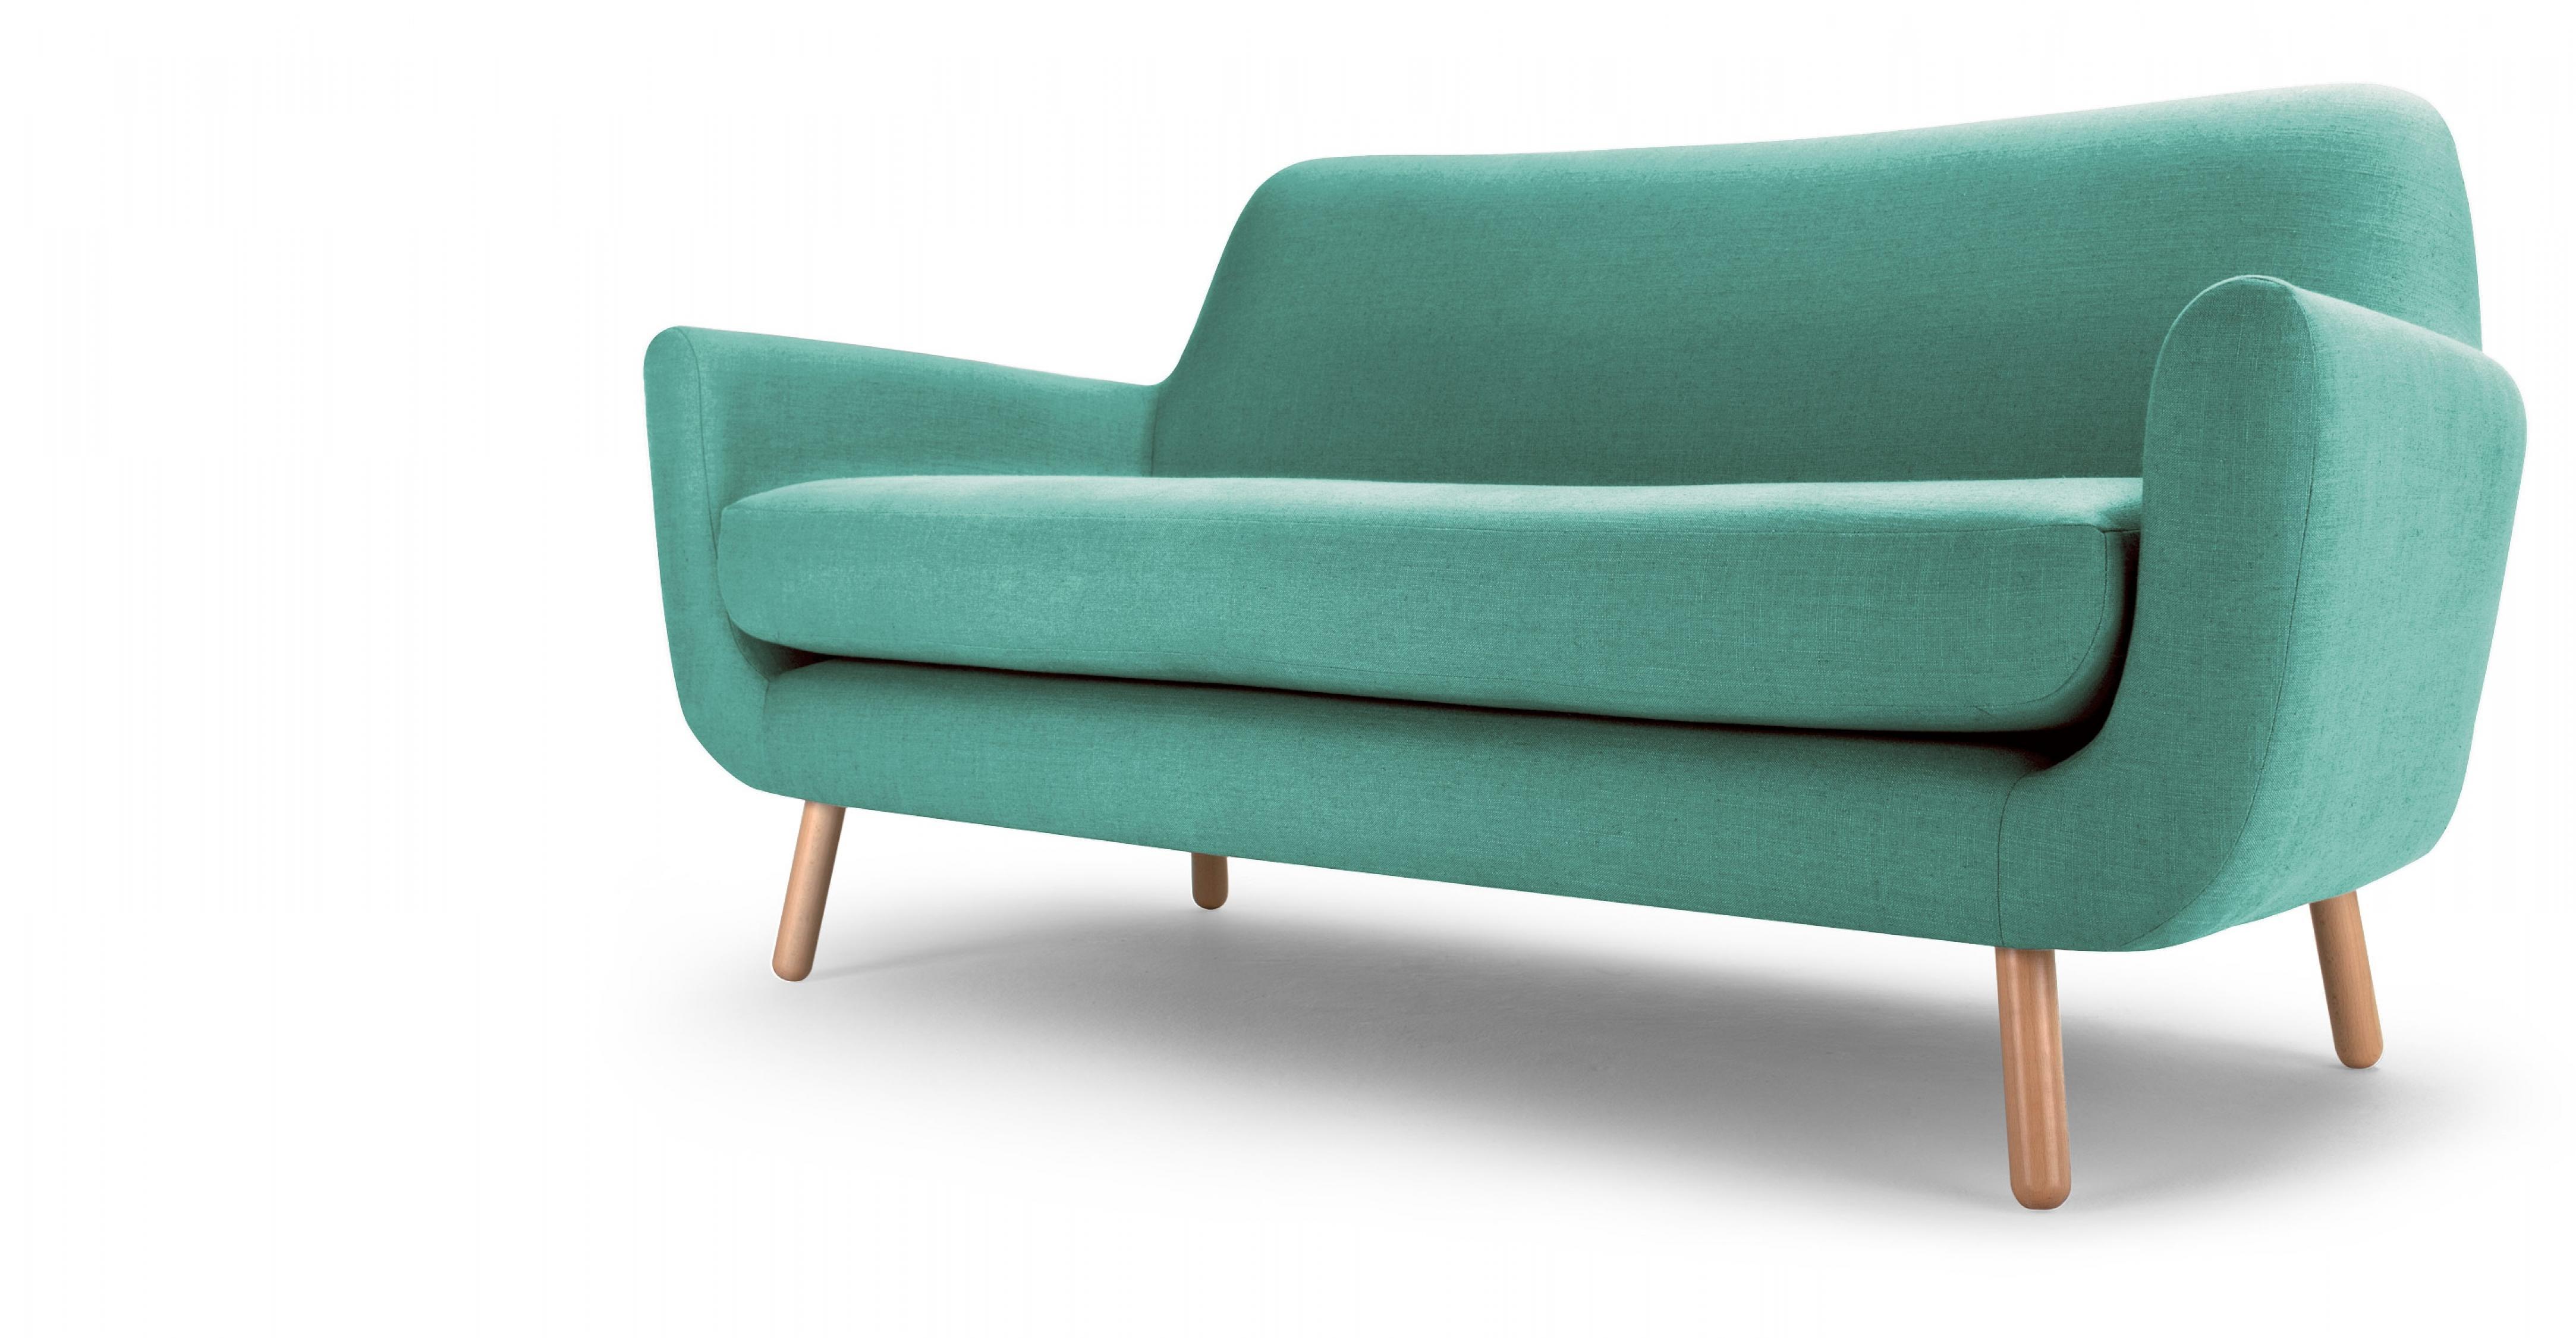 canap bleu turquoise canap convertible bz design duo bleu turquoise with canap bleu turquoise. Black Bedroom Furniture Sets. Home Design Ideas